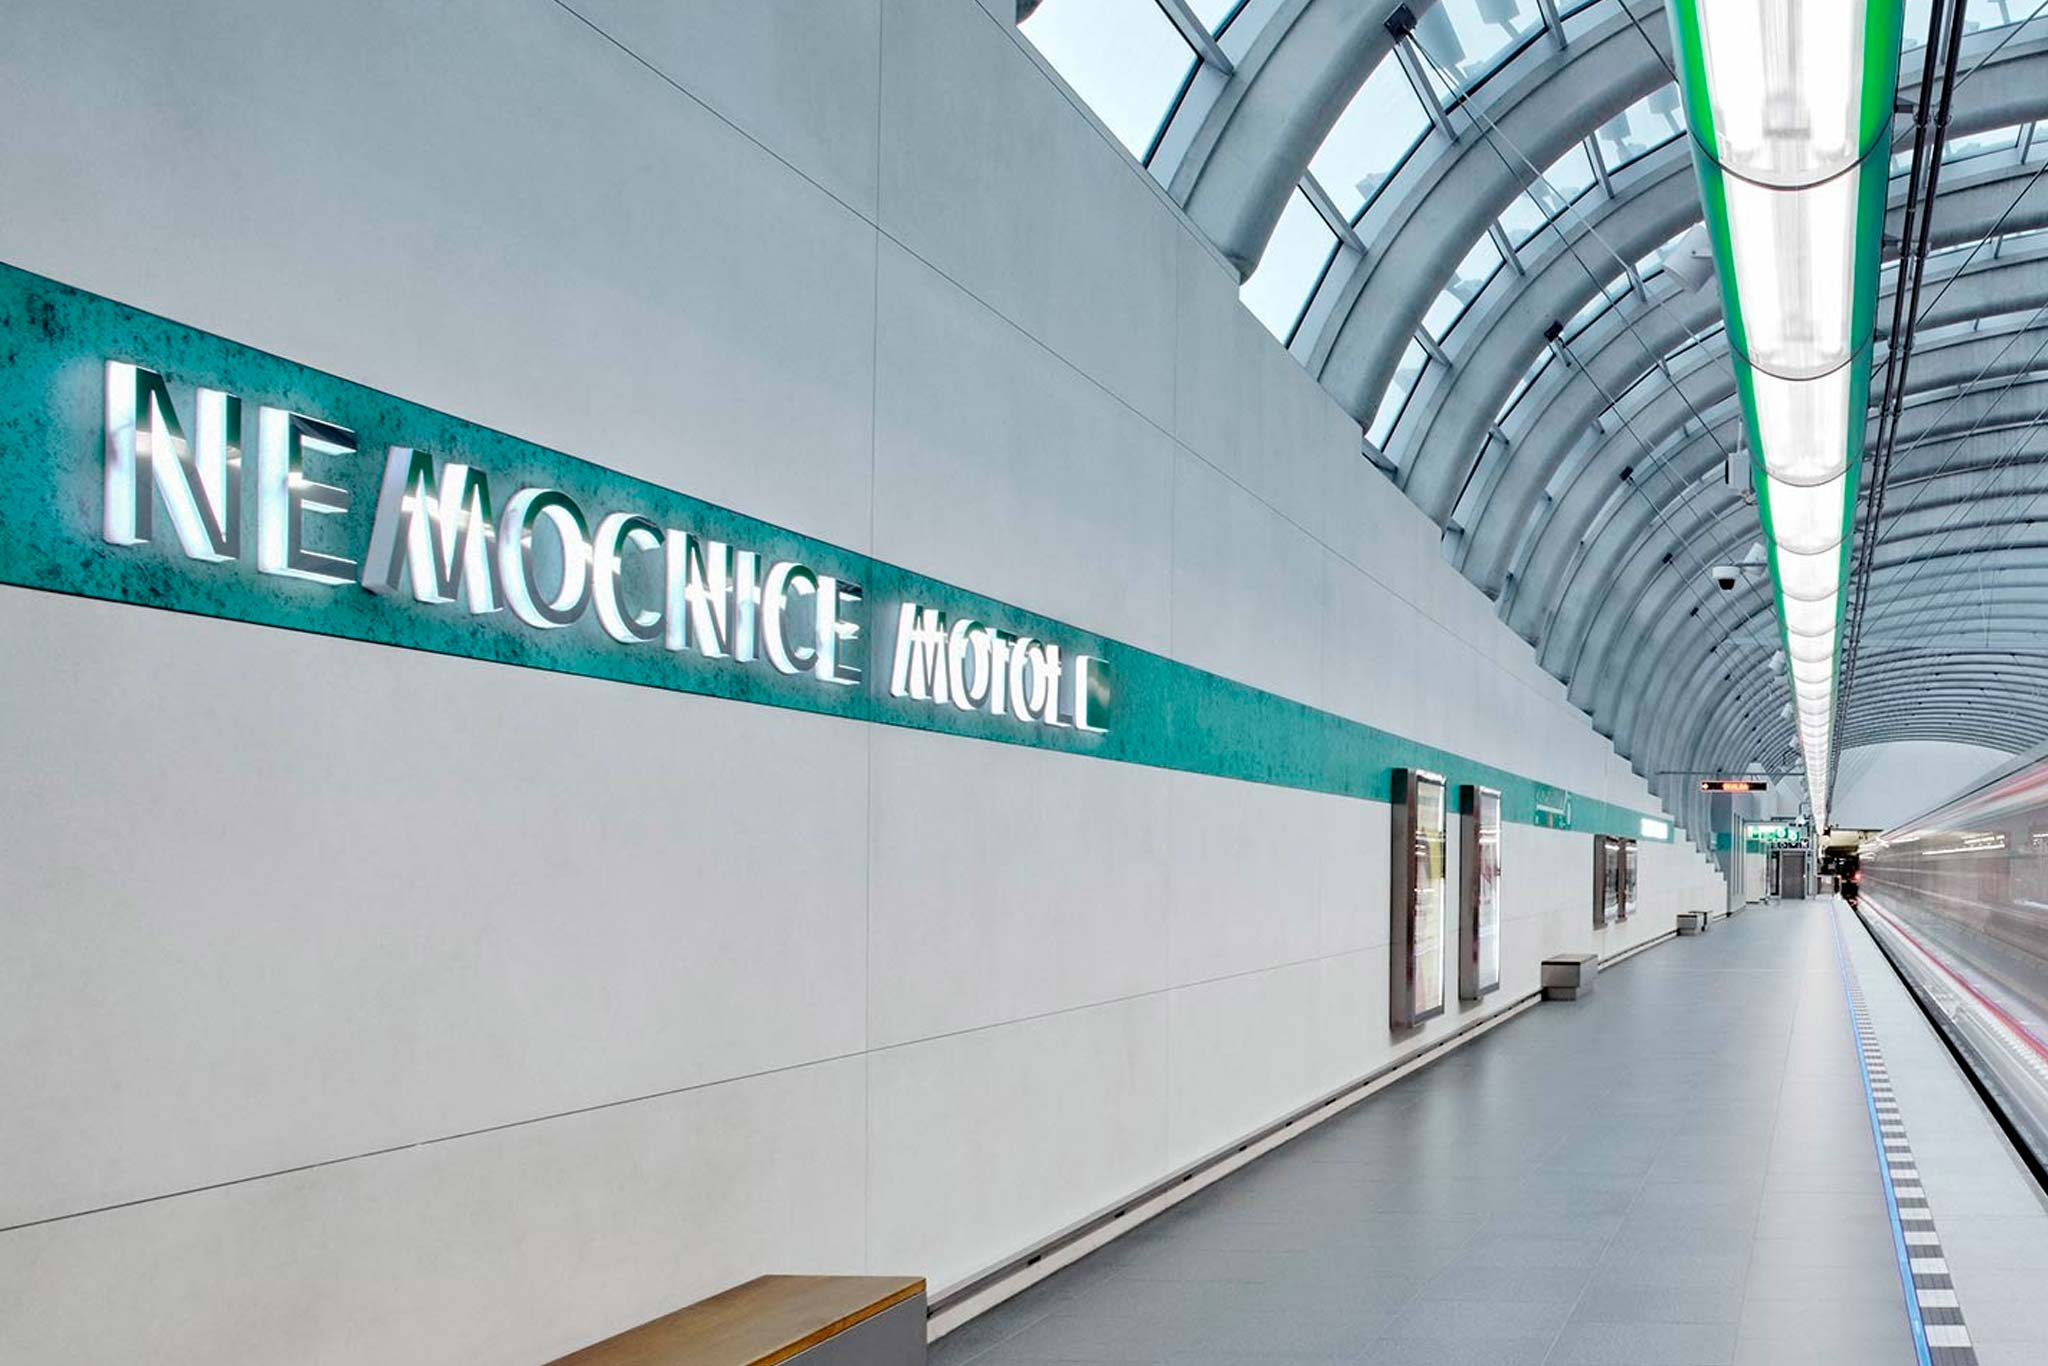 Nemocnice-Motol